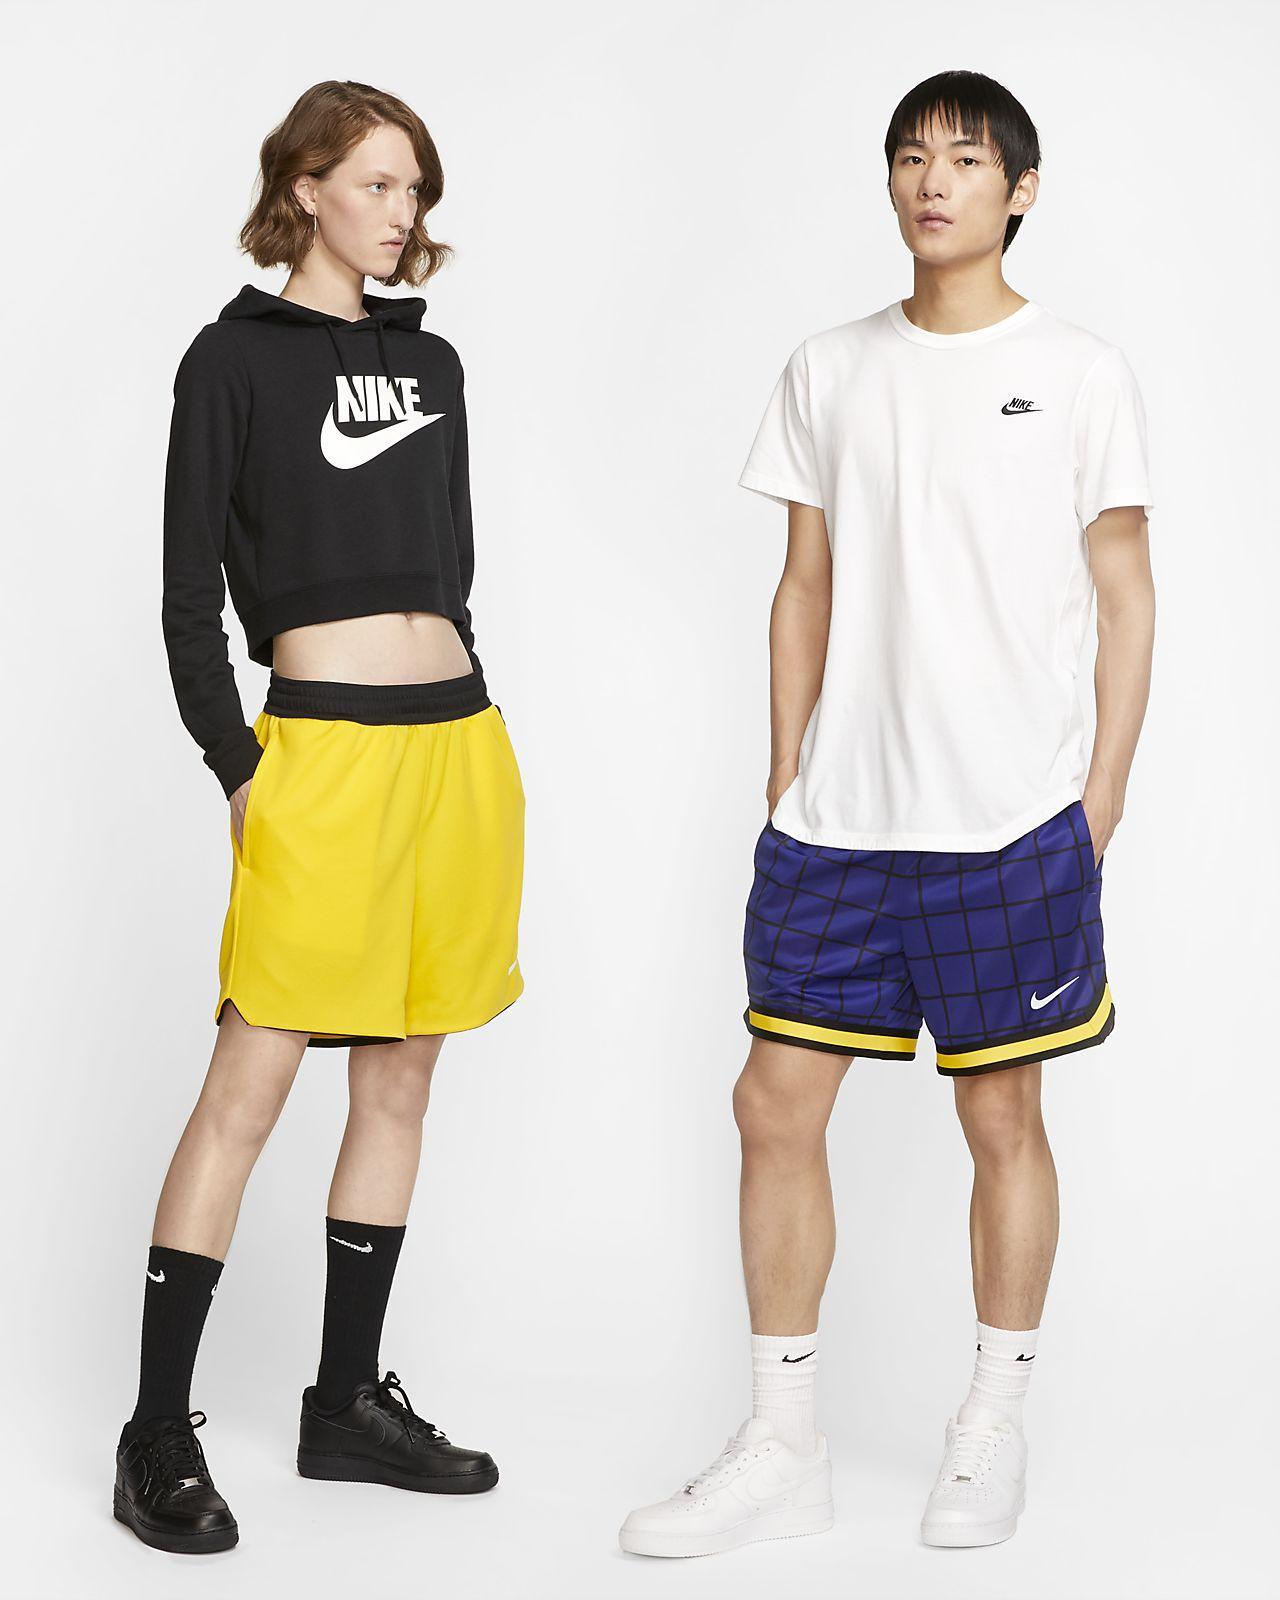 Nike 男子双面穿短裤